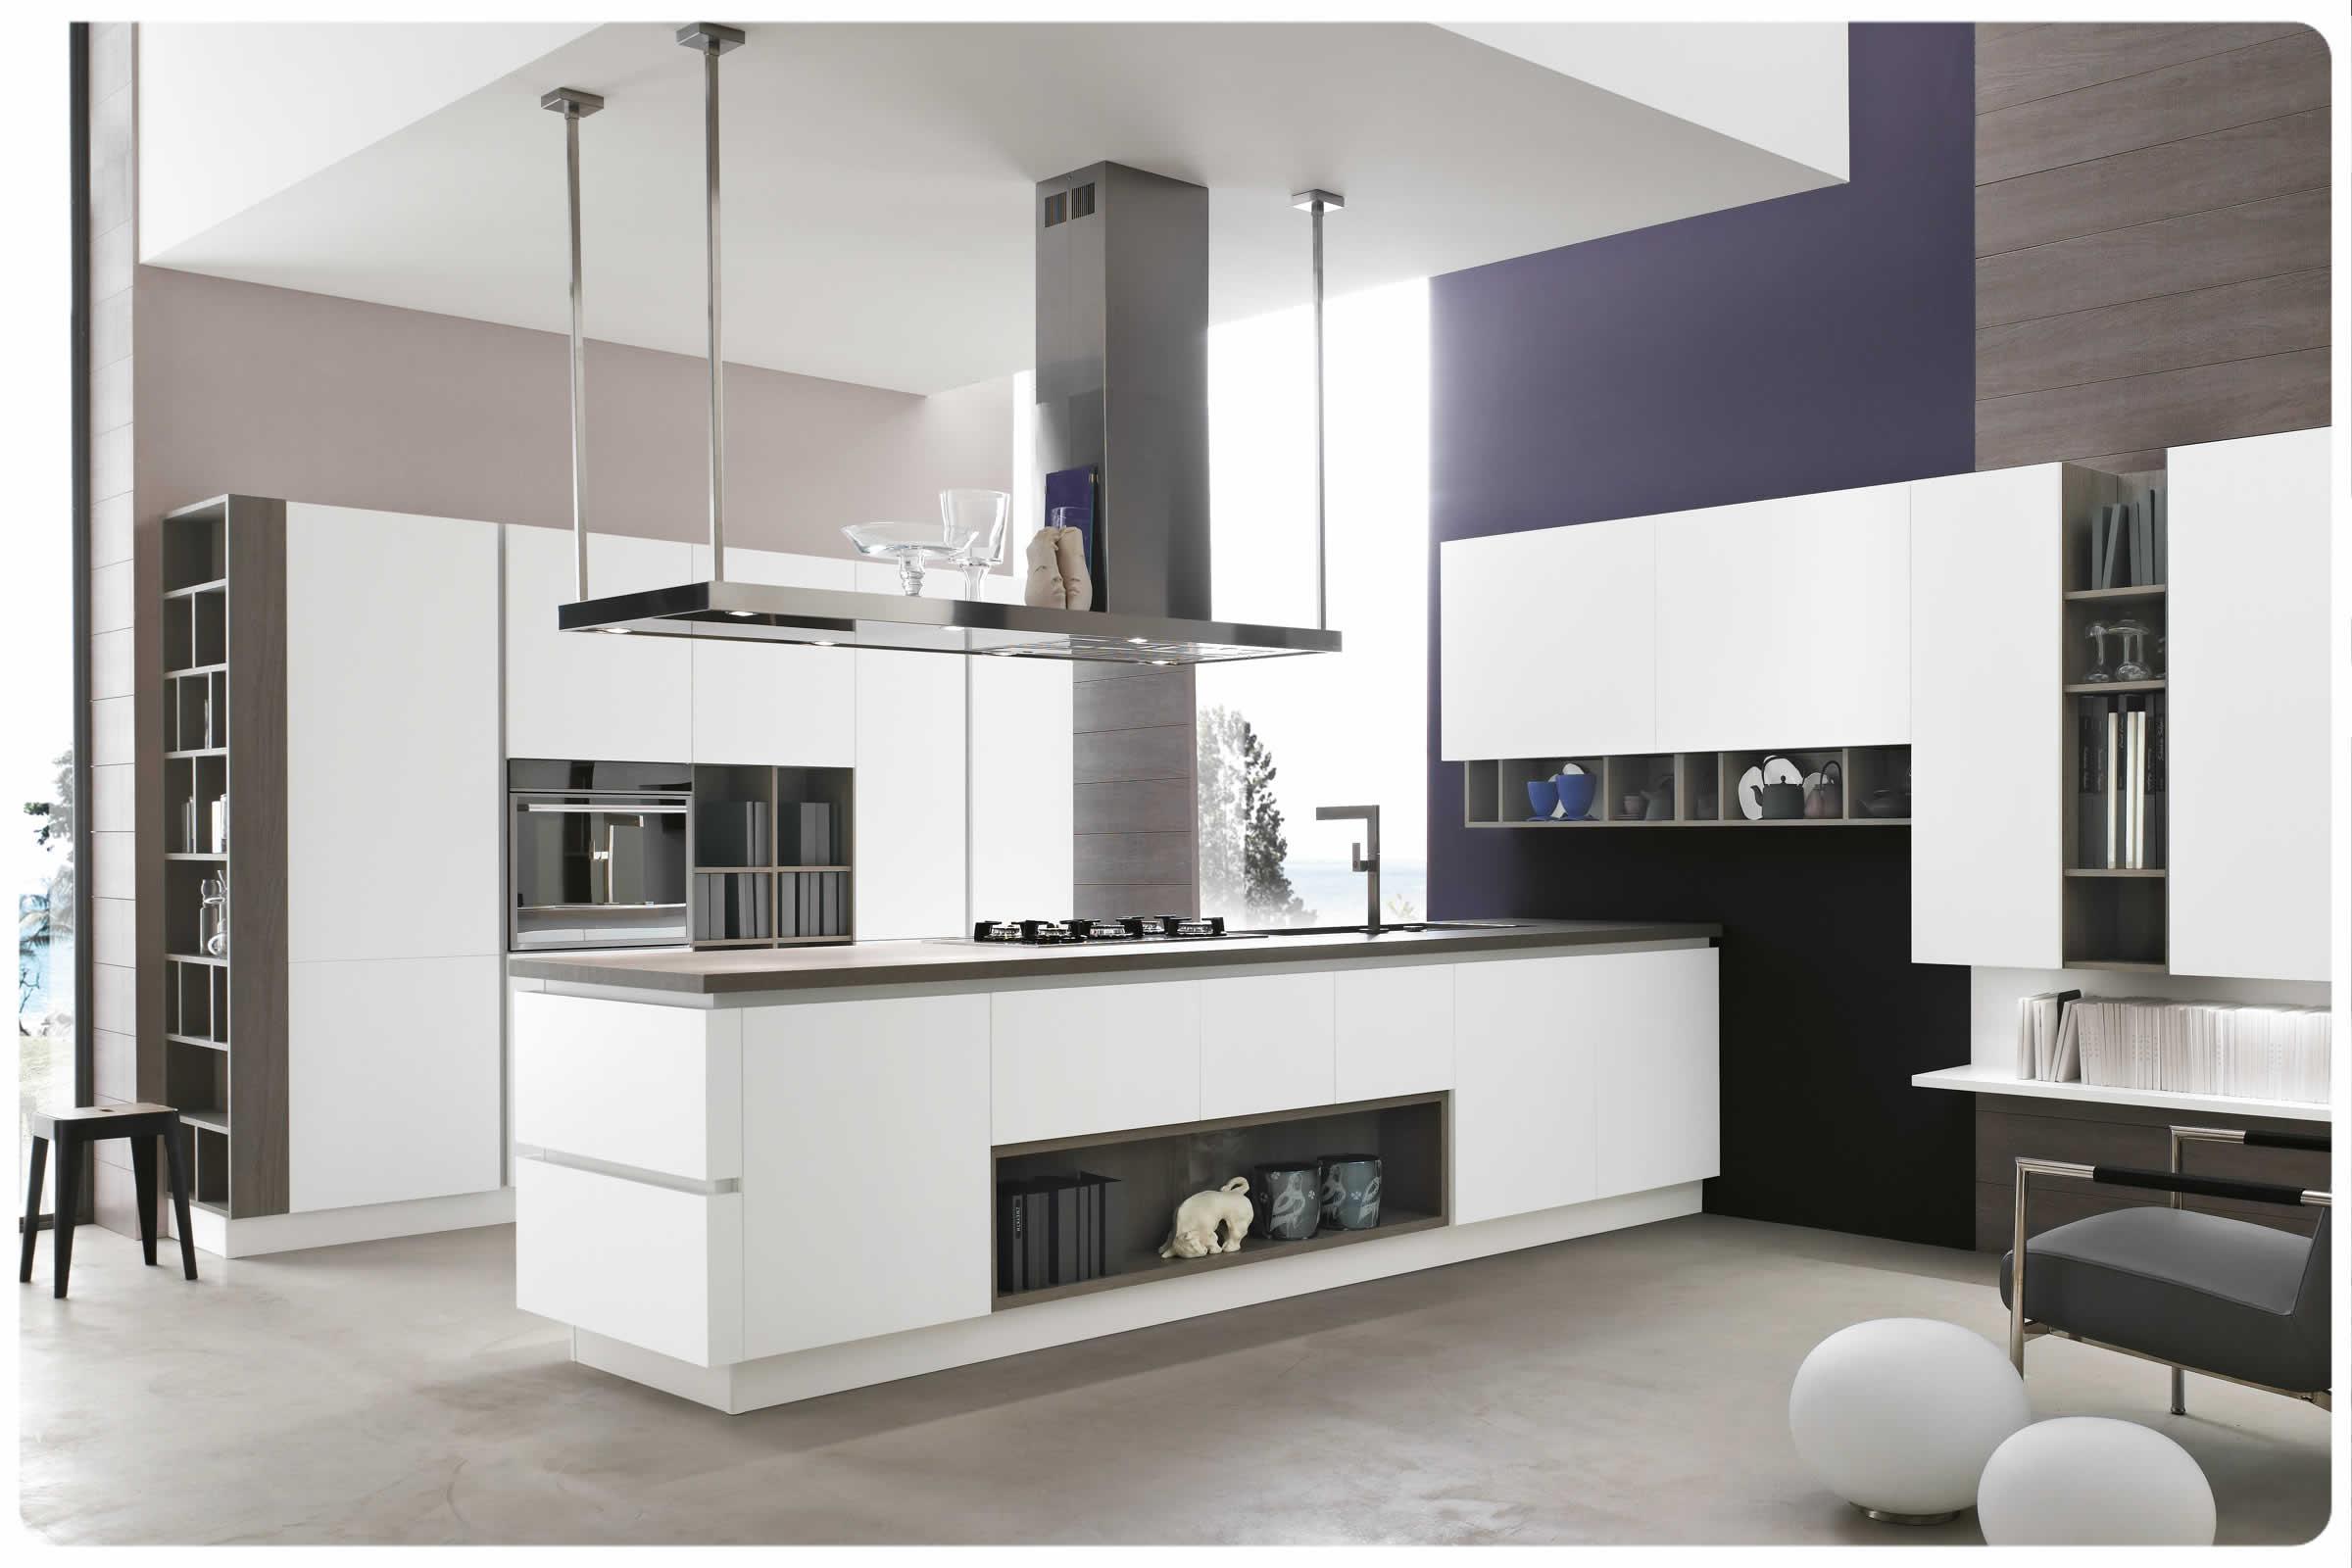 Cucine Bianche Moderne. Cucine Moderne Con Isola Bianche Laccatego ...